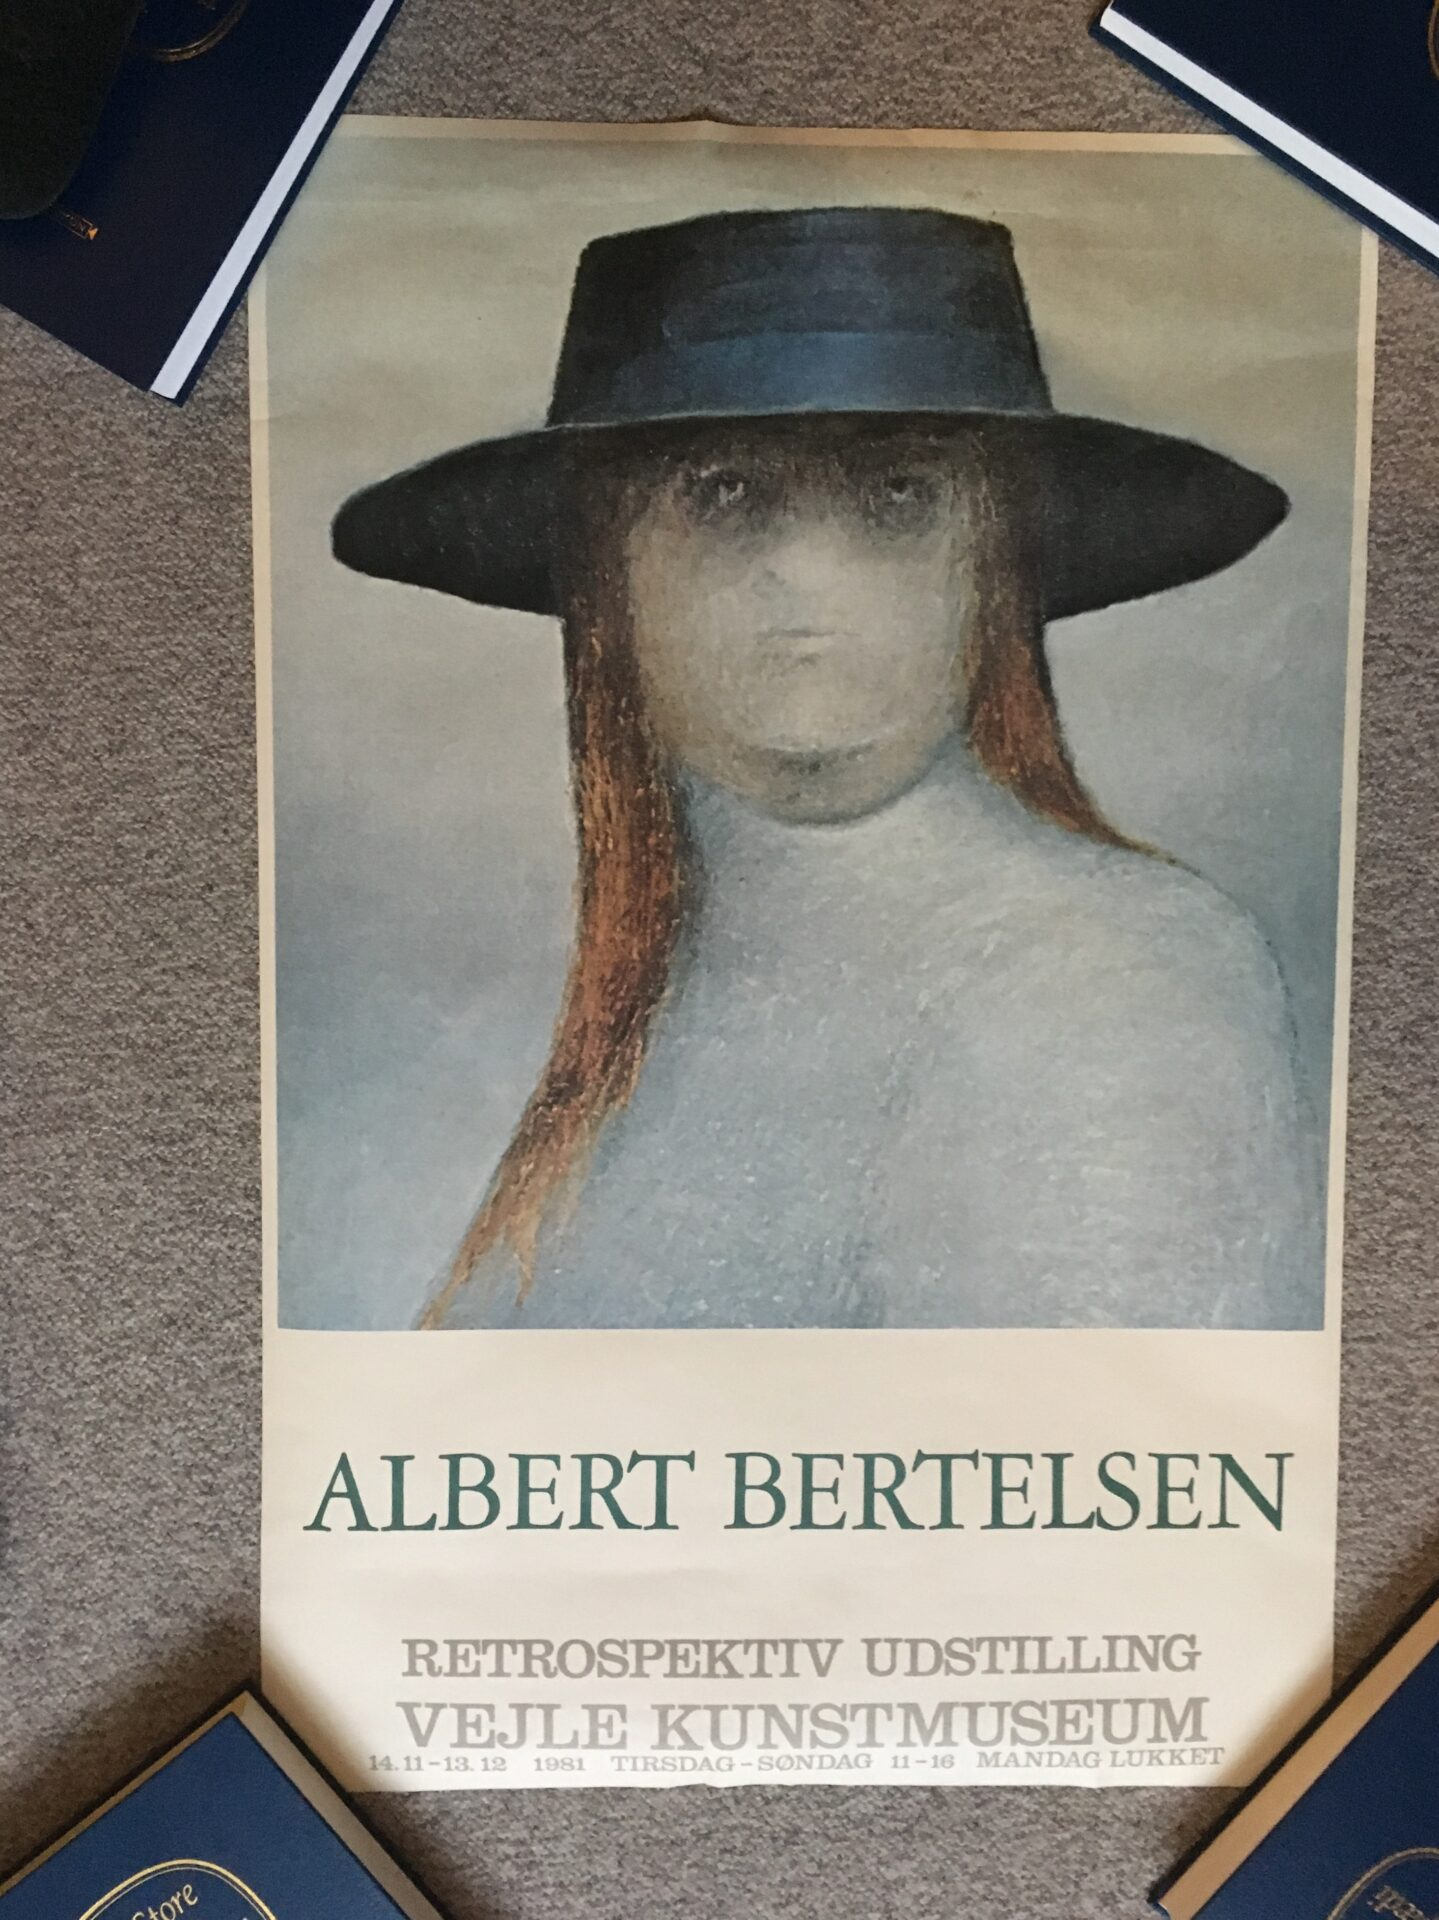 Albert Bertelsen retrospektiv udstilling 1981, uindrammet rullet plakat,  60x90 cm, pris 300 kr